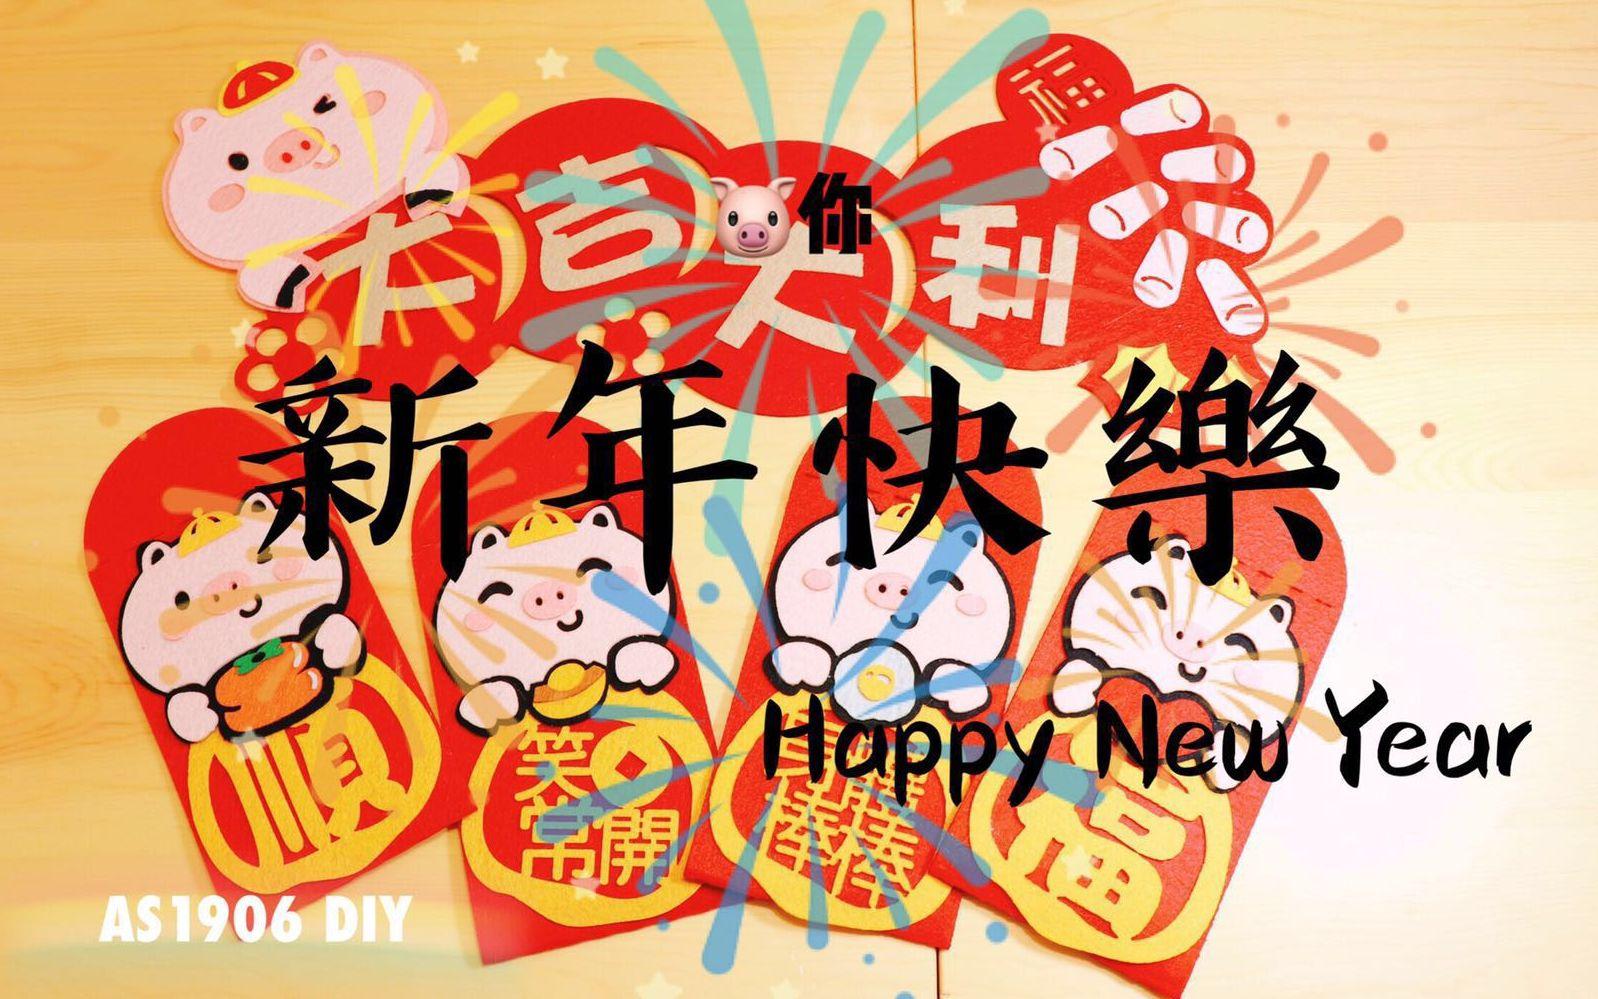 【diy】手工制作猪年卡通对联门幅红包,提前祝大家猪年大吉,安康幸福!图片